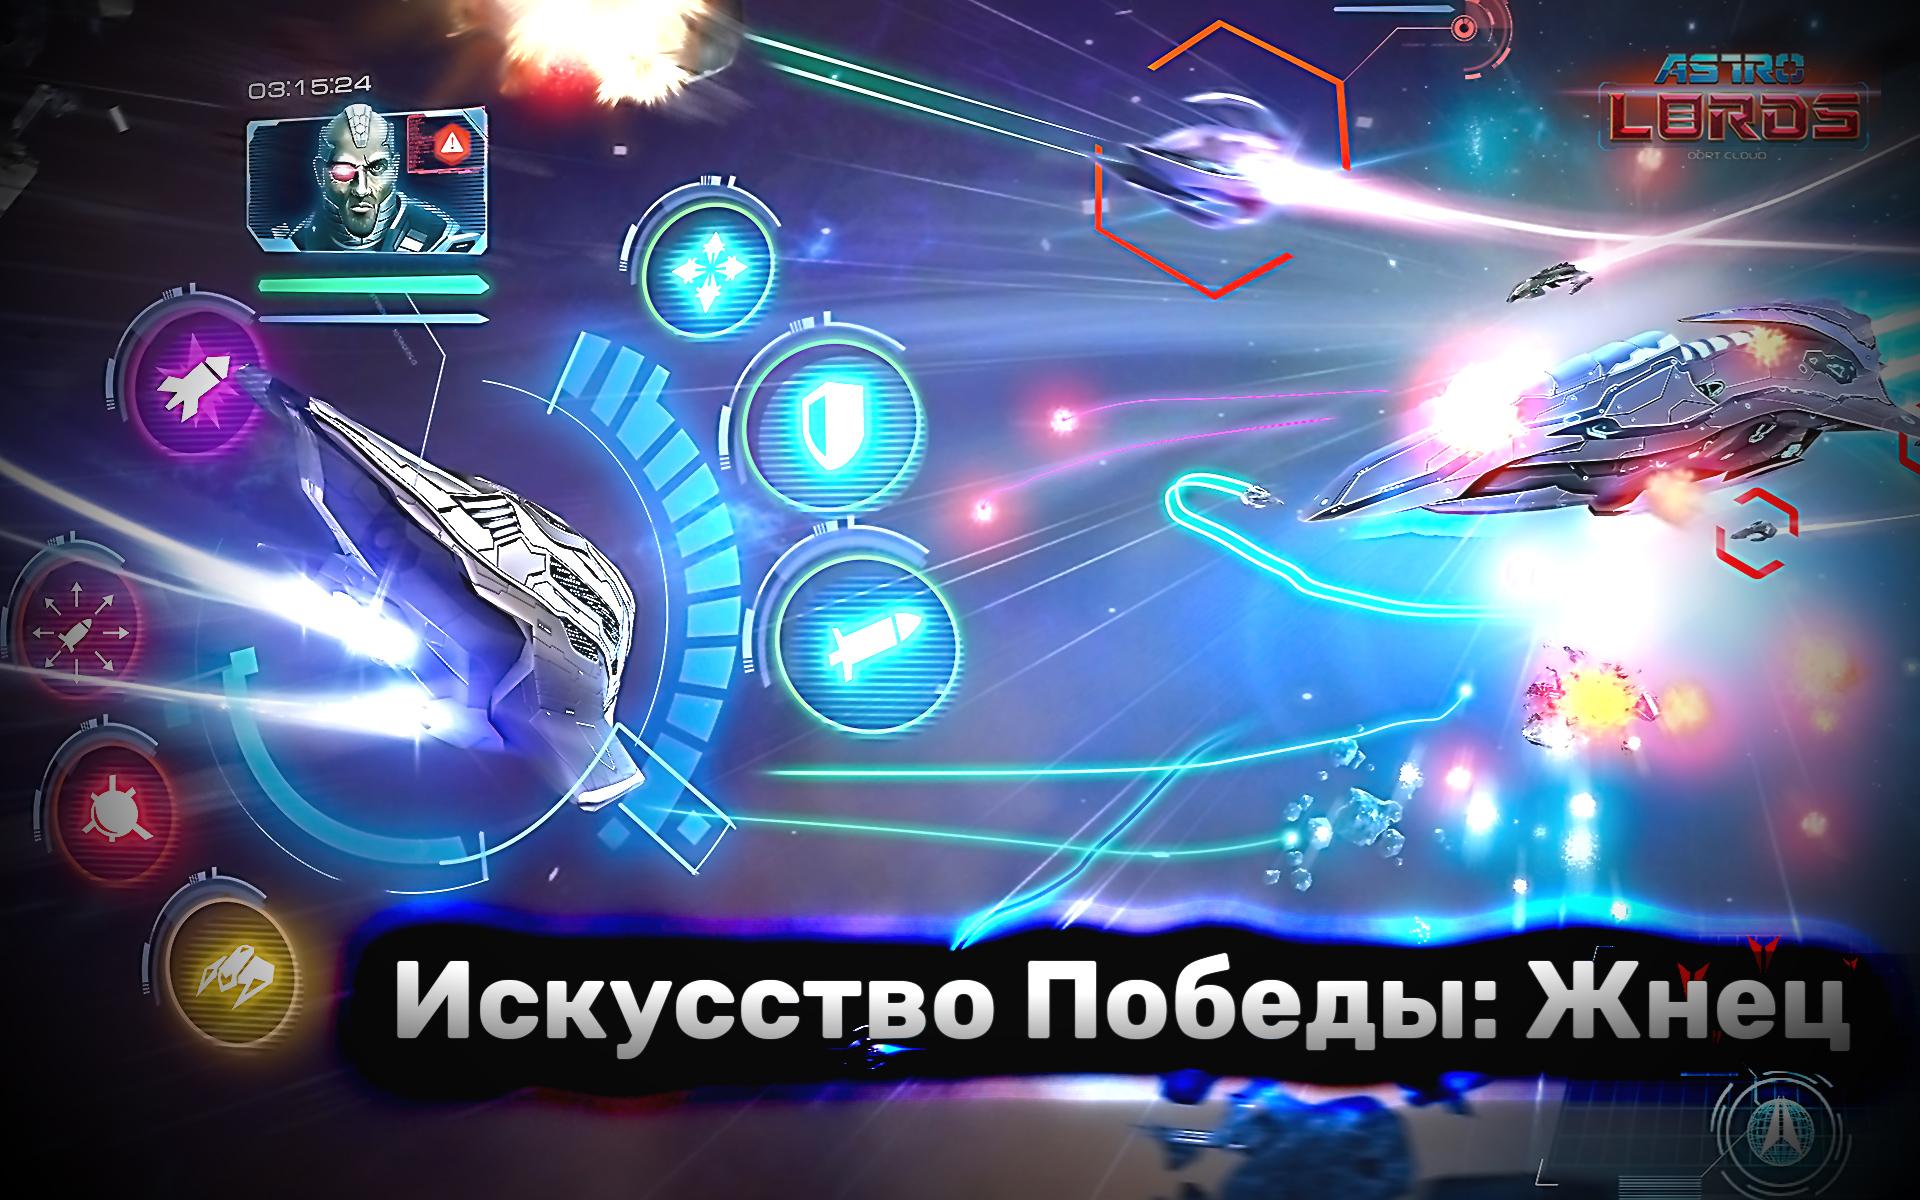 astrolords game mmo space challenge челлендж игра премиум корабли астролорды ммо вывод денег